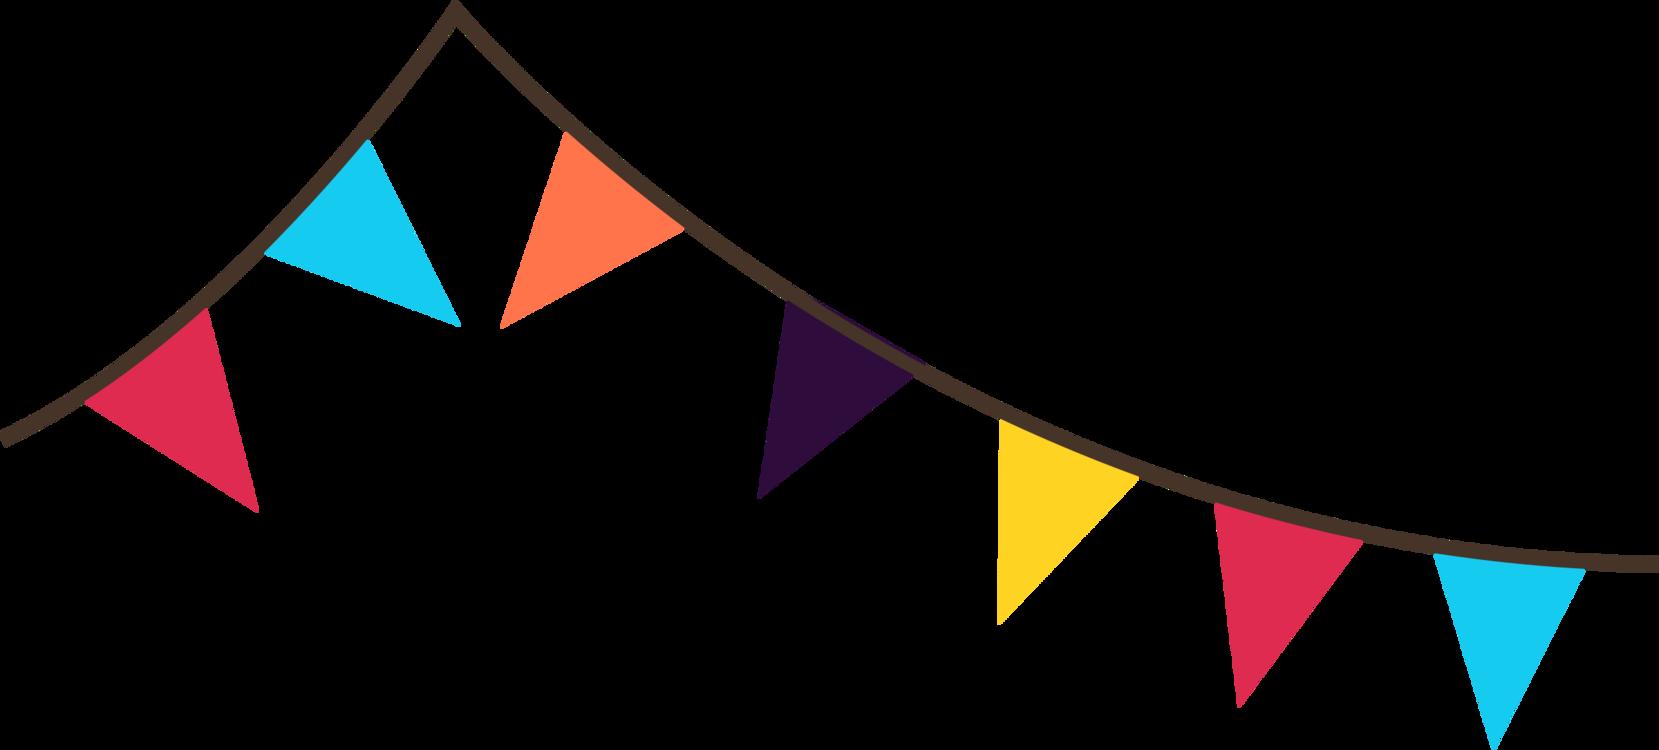 Graphic triangle symmetry png. Festival clipart logo design